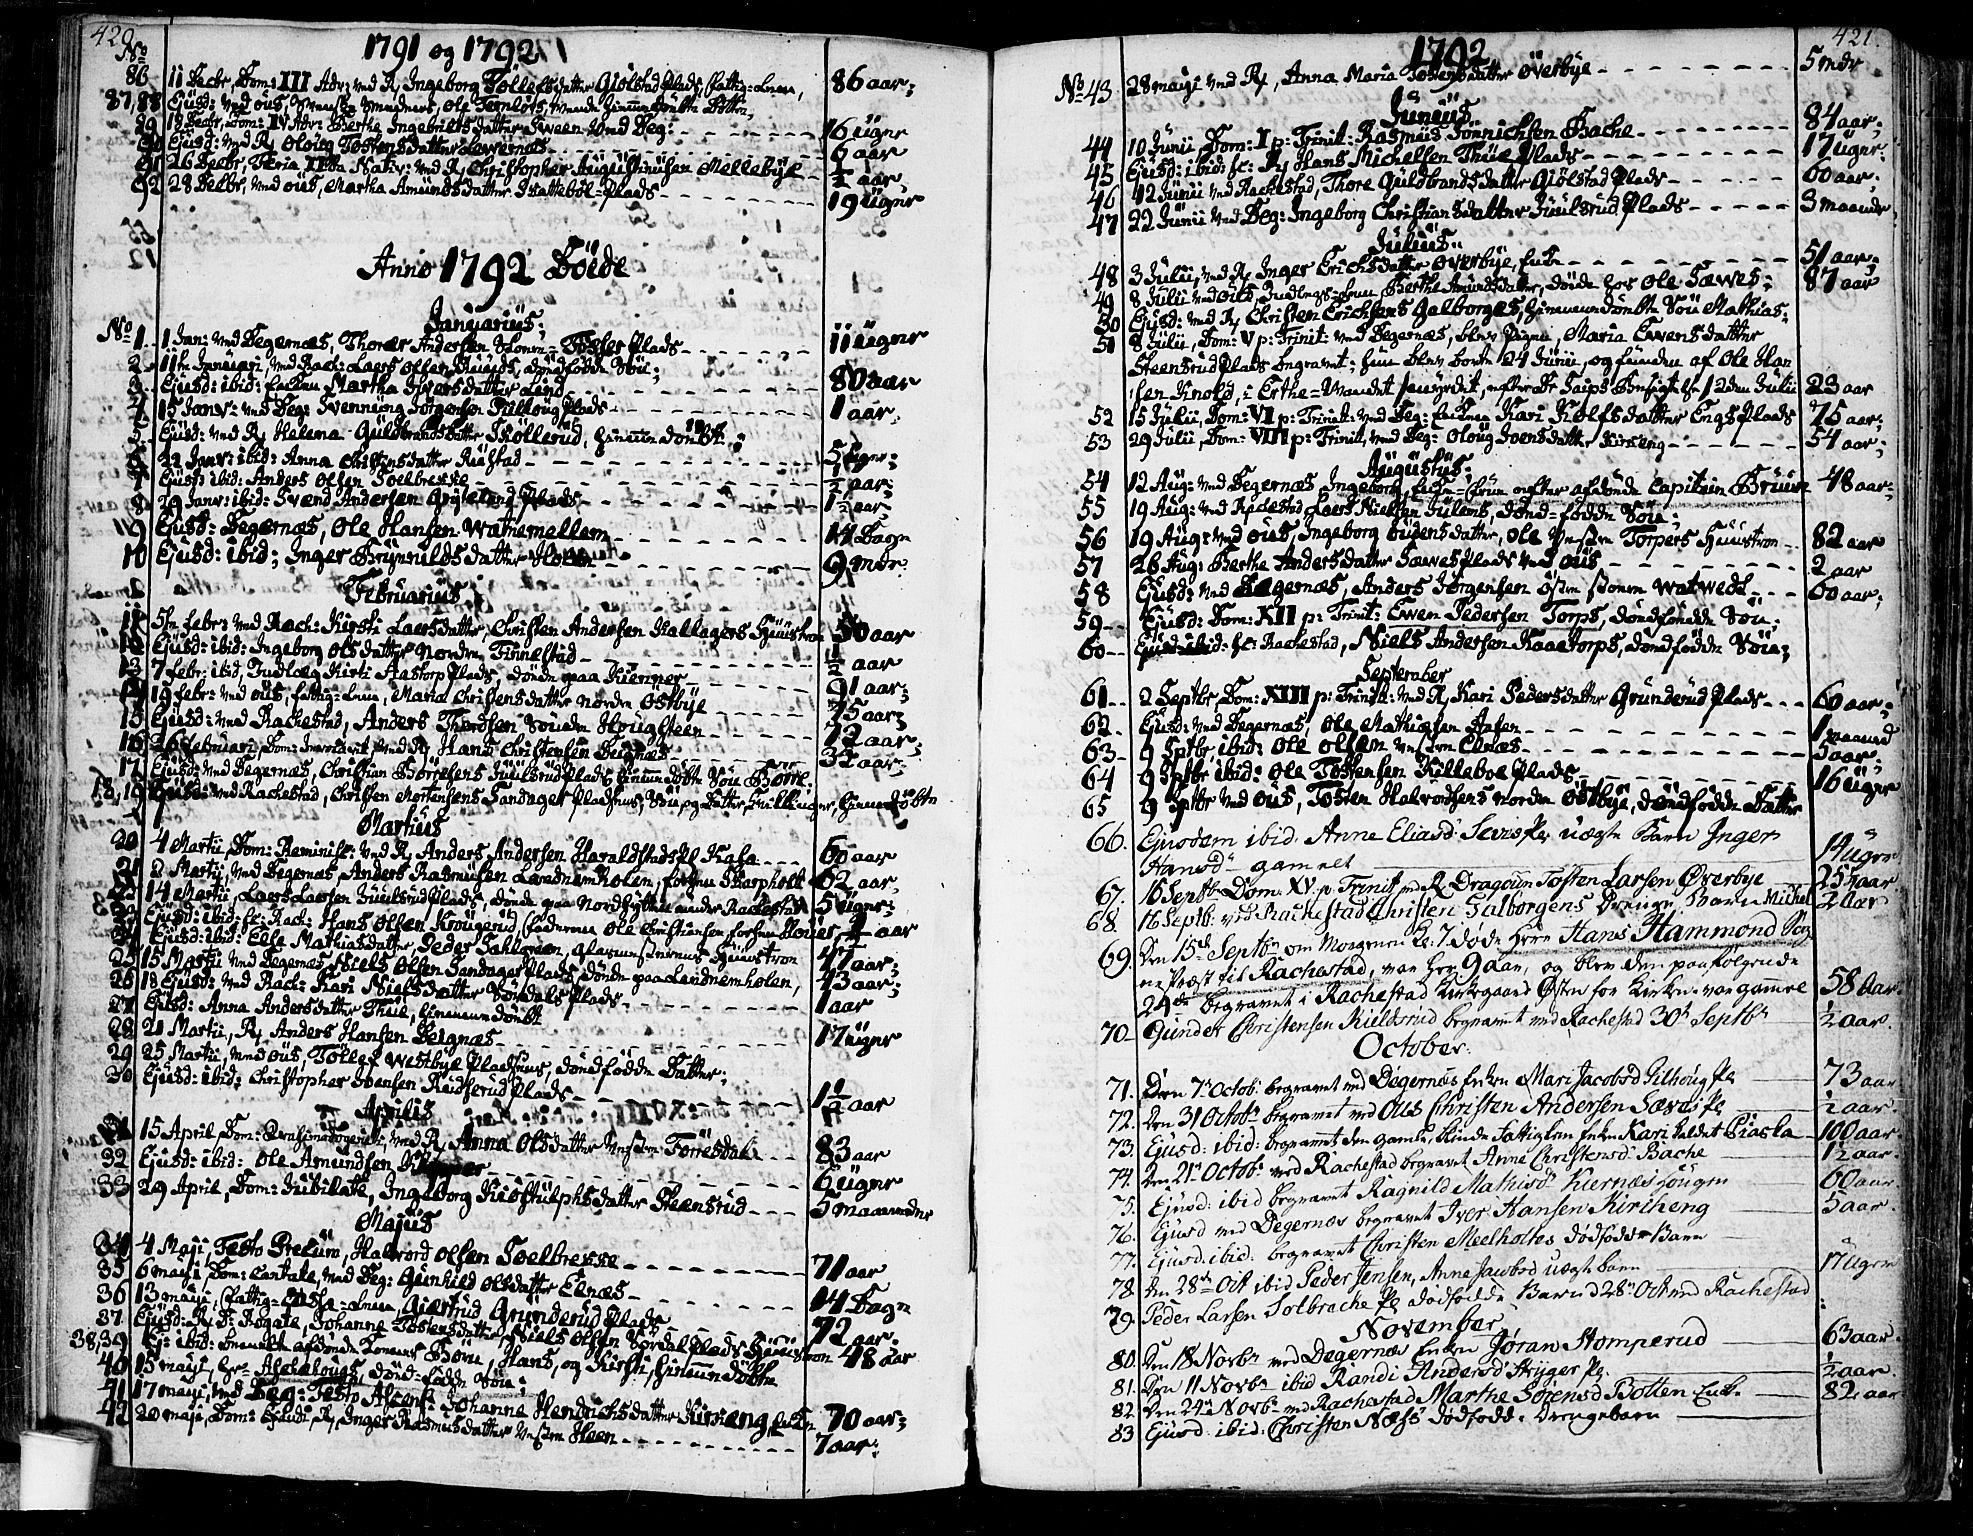 SAO, Rakkestad prestekontor Kirkebøker, F/Fa/L0005: Ministerialbok nr. I 5, 1784-1814, s. 420-421